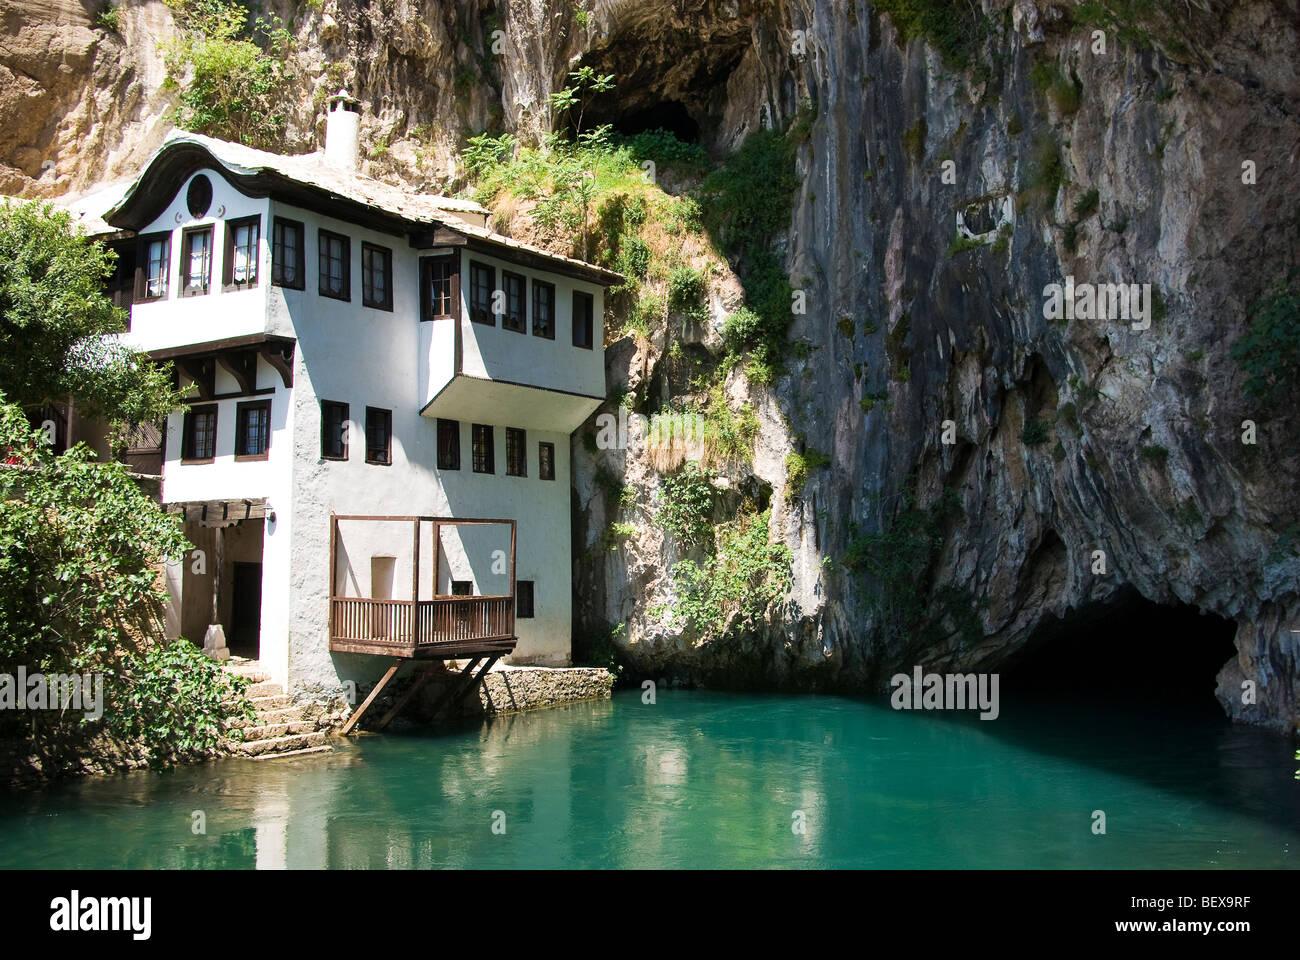 Medieval dervish tekija (Monastery) built by Ottomans, Buna springs, Bosnia & Herzegovina - Stock Image